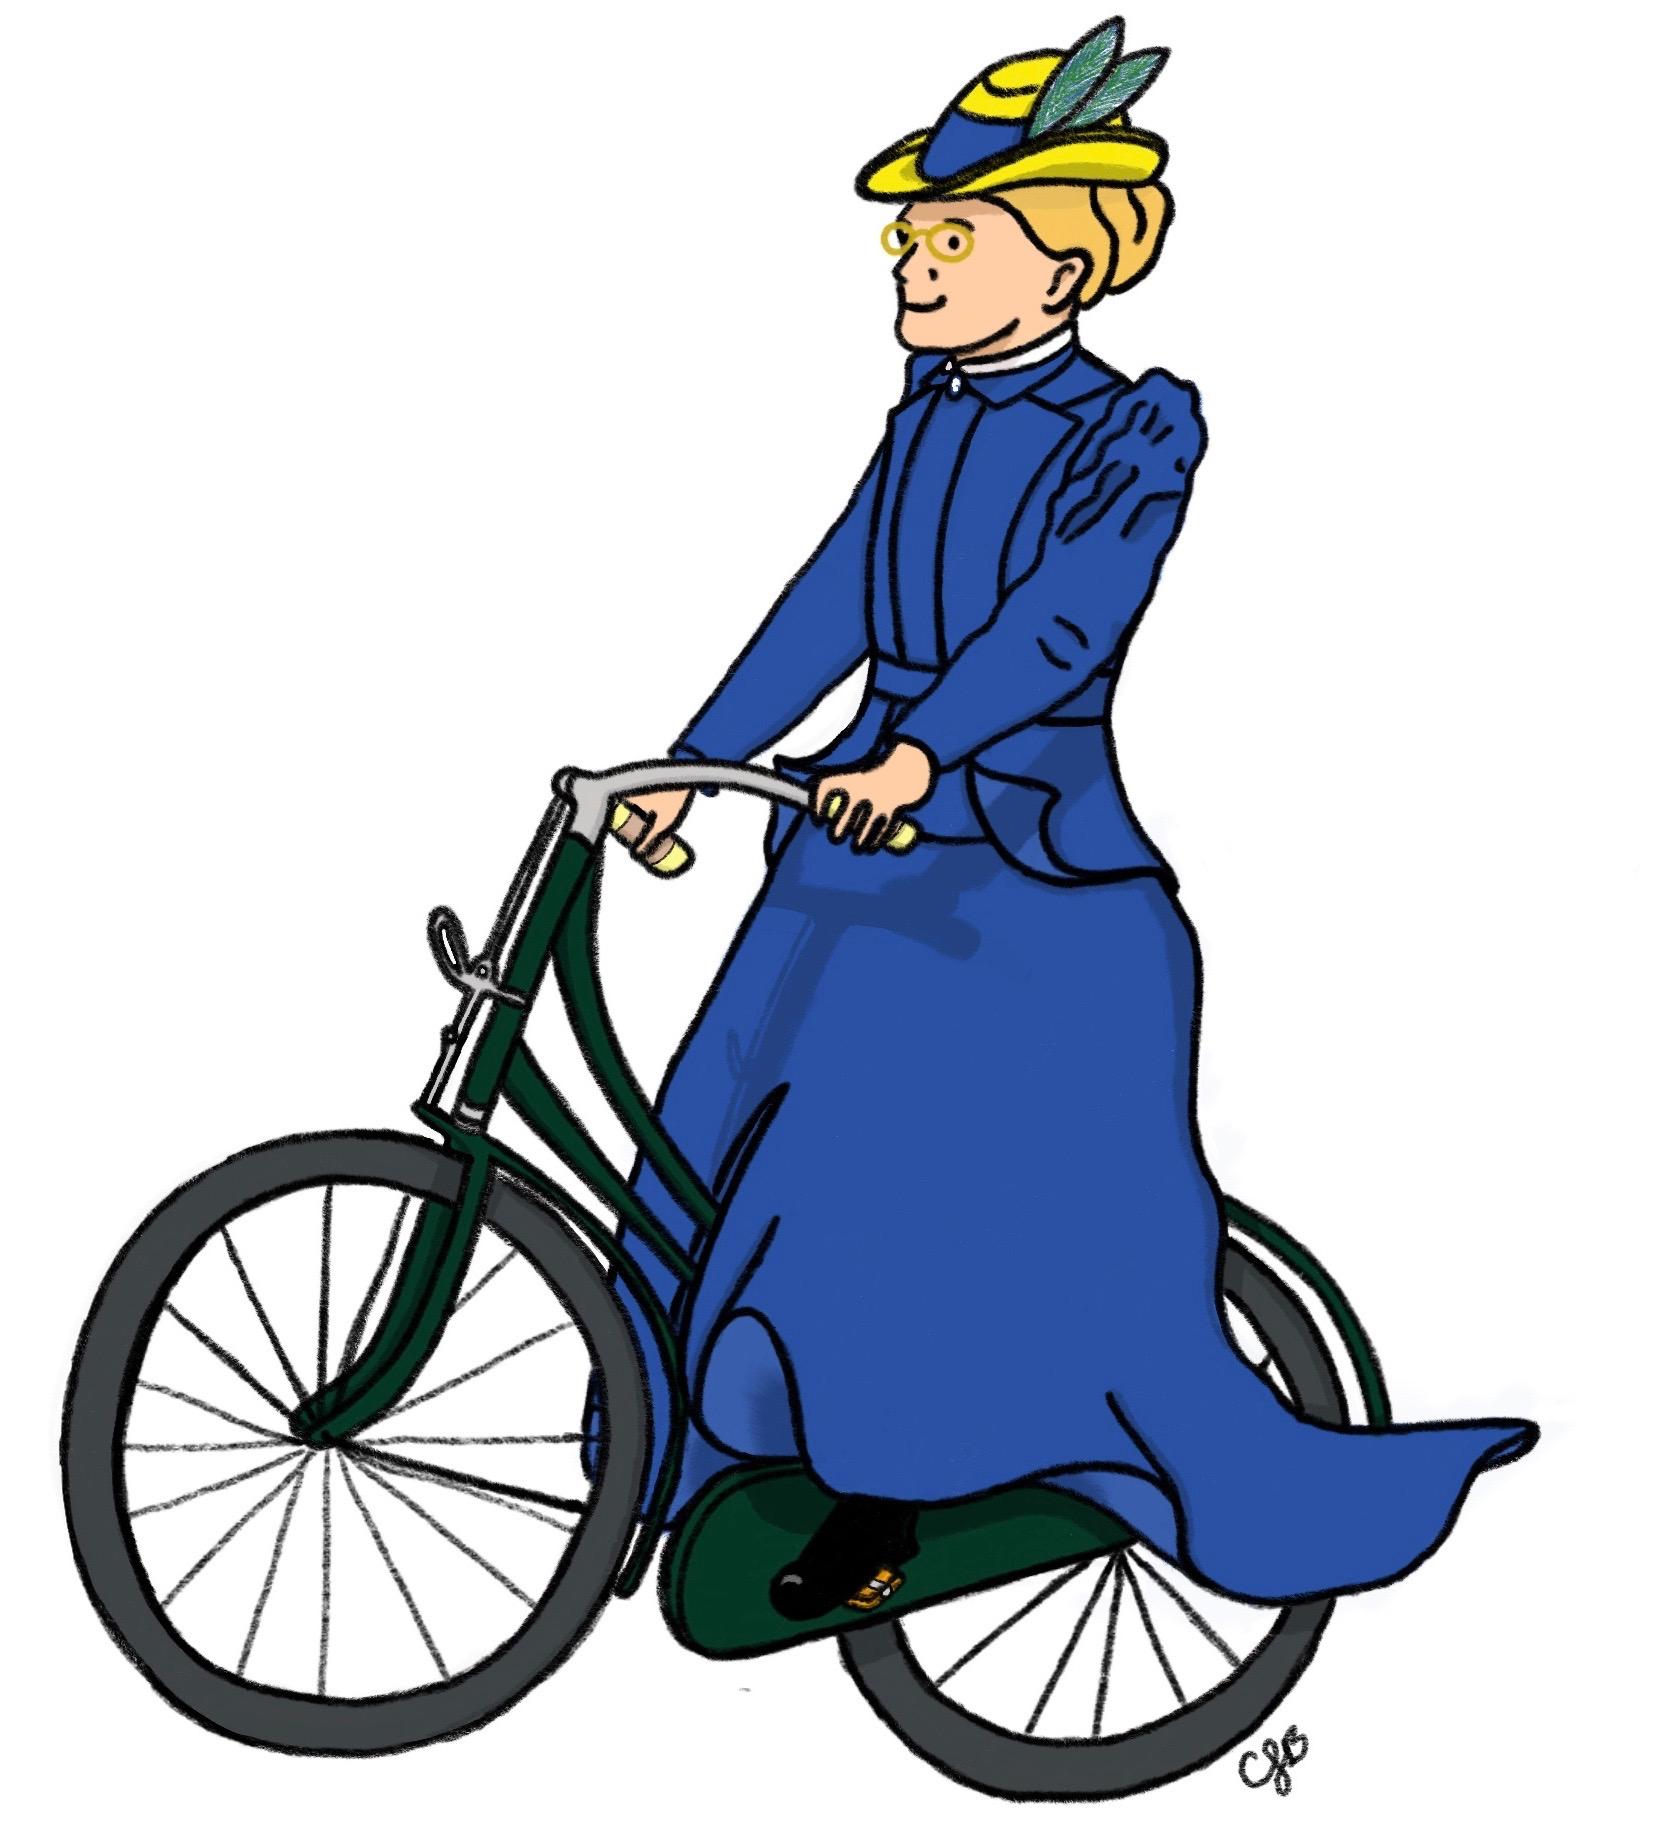 FEW on bicycle 2